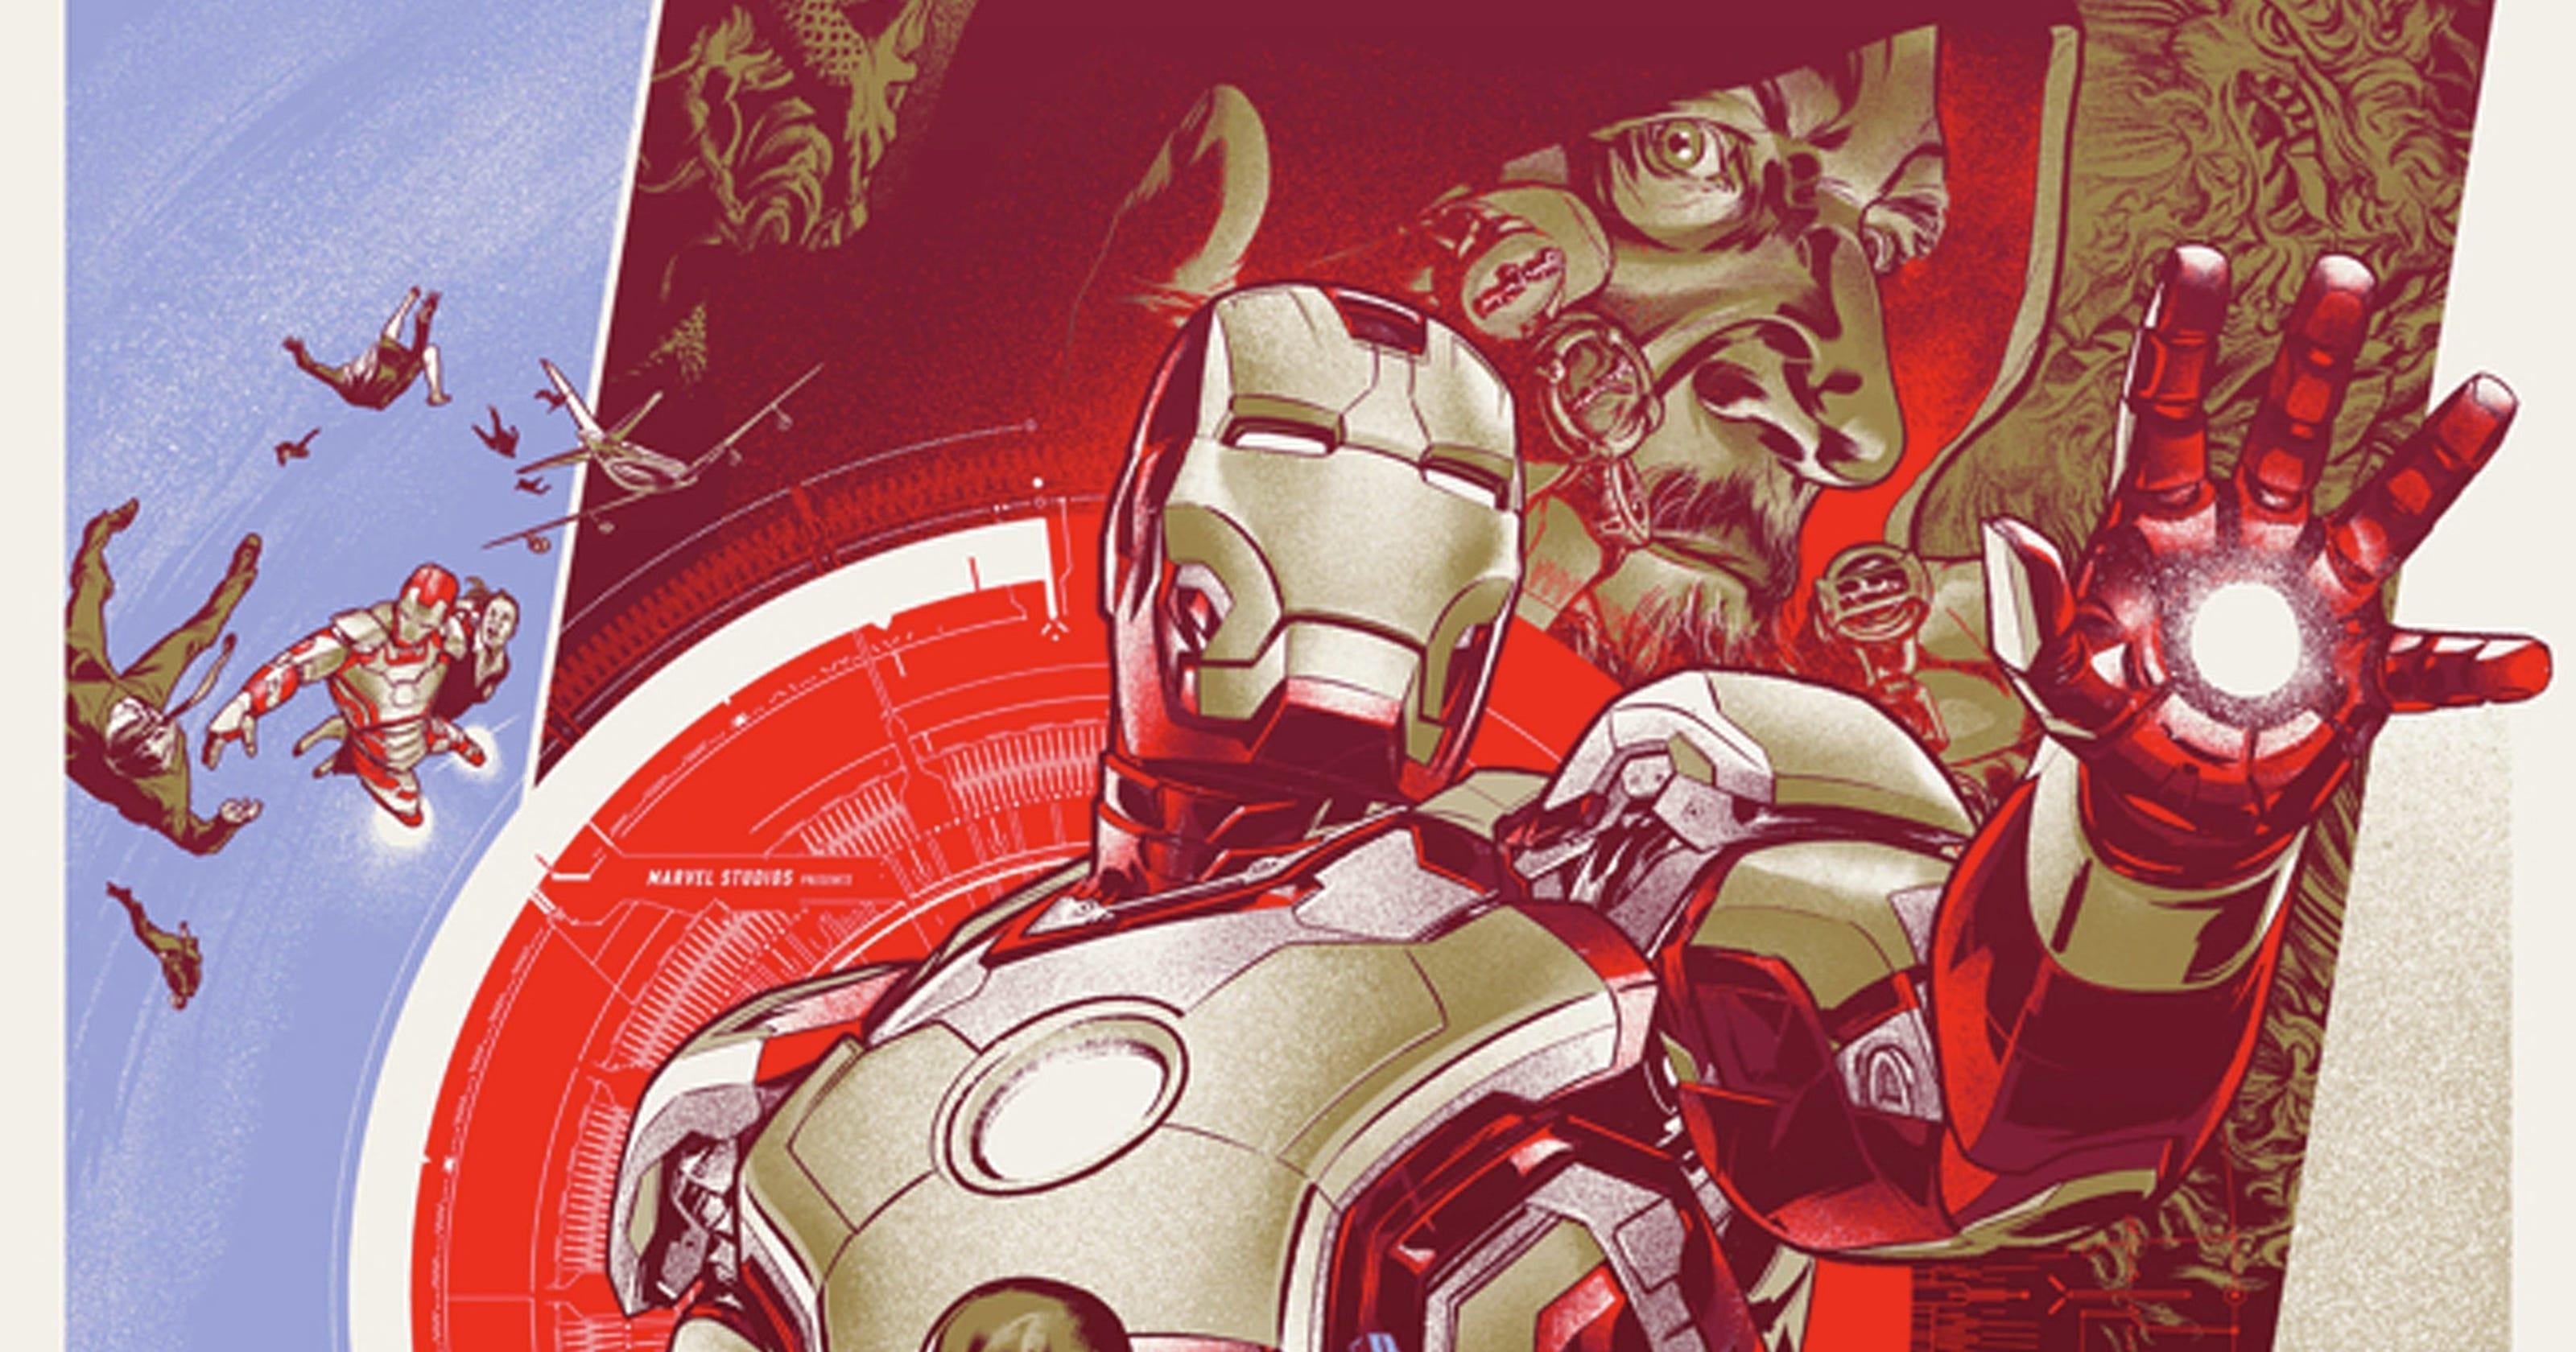 Mondo Unveils Three Collectible Iron Man 3 Posters Suit Schematics